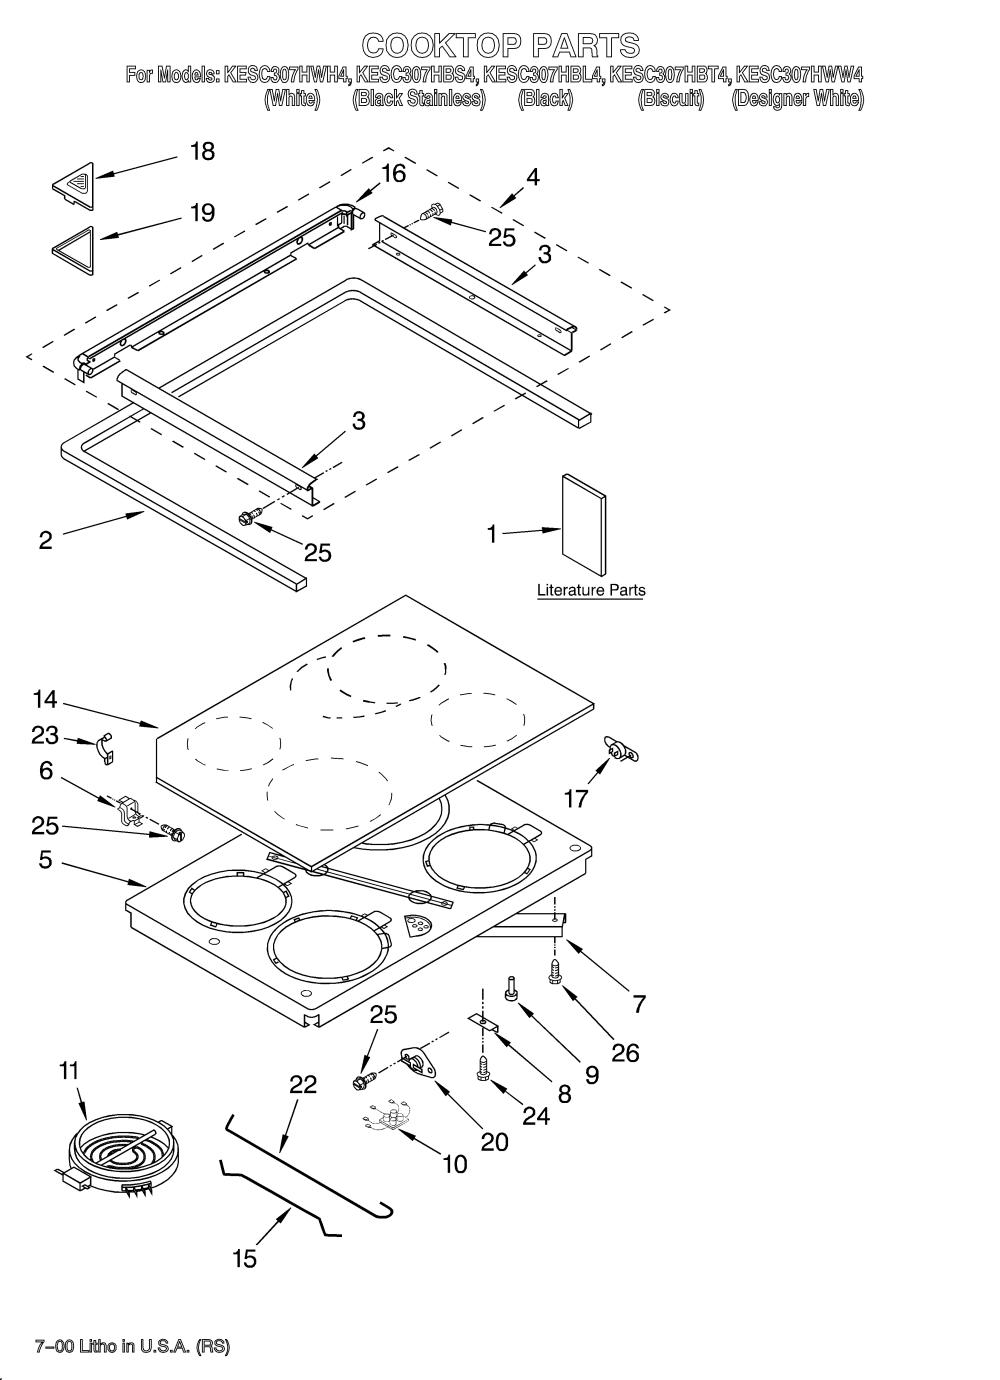 medium resolution of kesc307hbt4 electric slide in range cooktop literature parts diagram kitchenaid kesc307hbt4